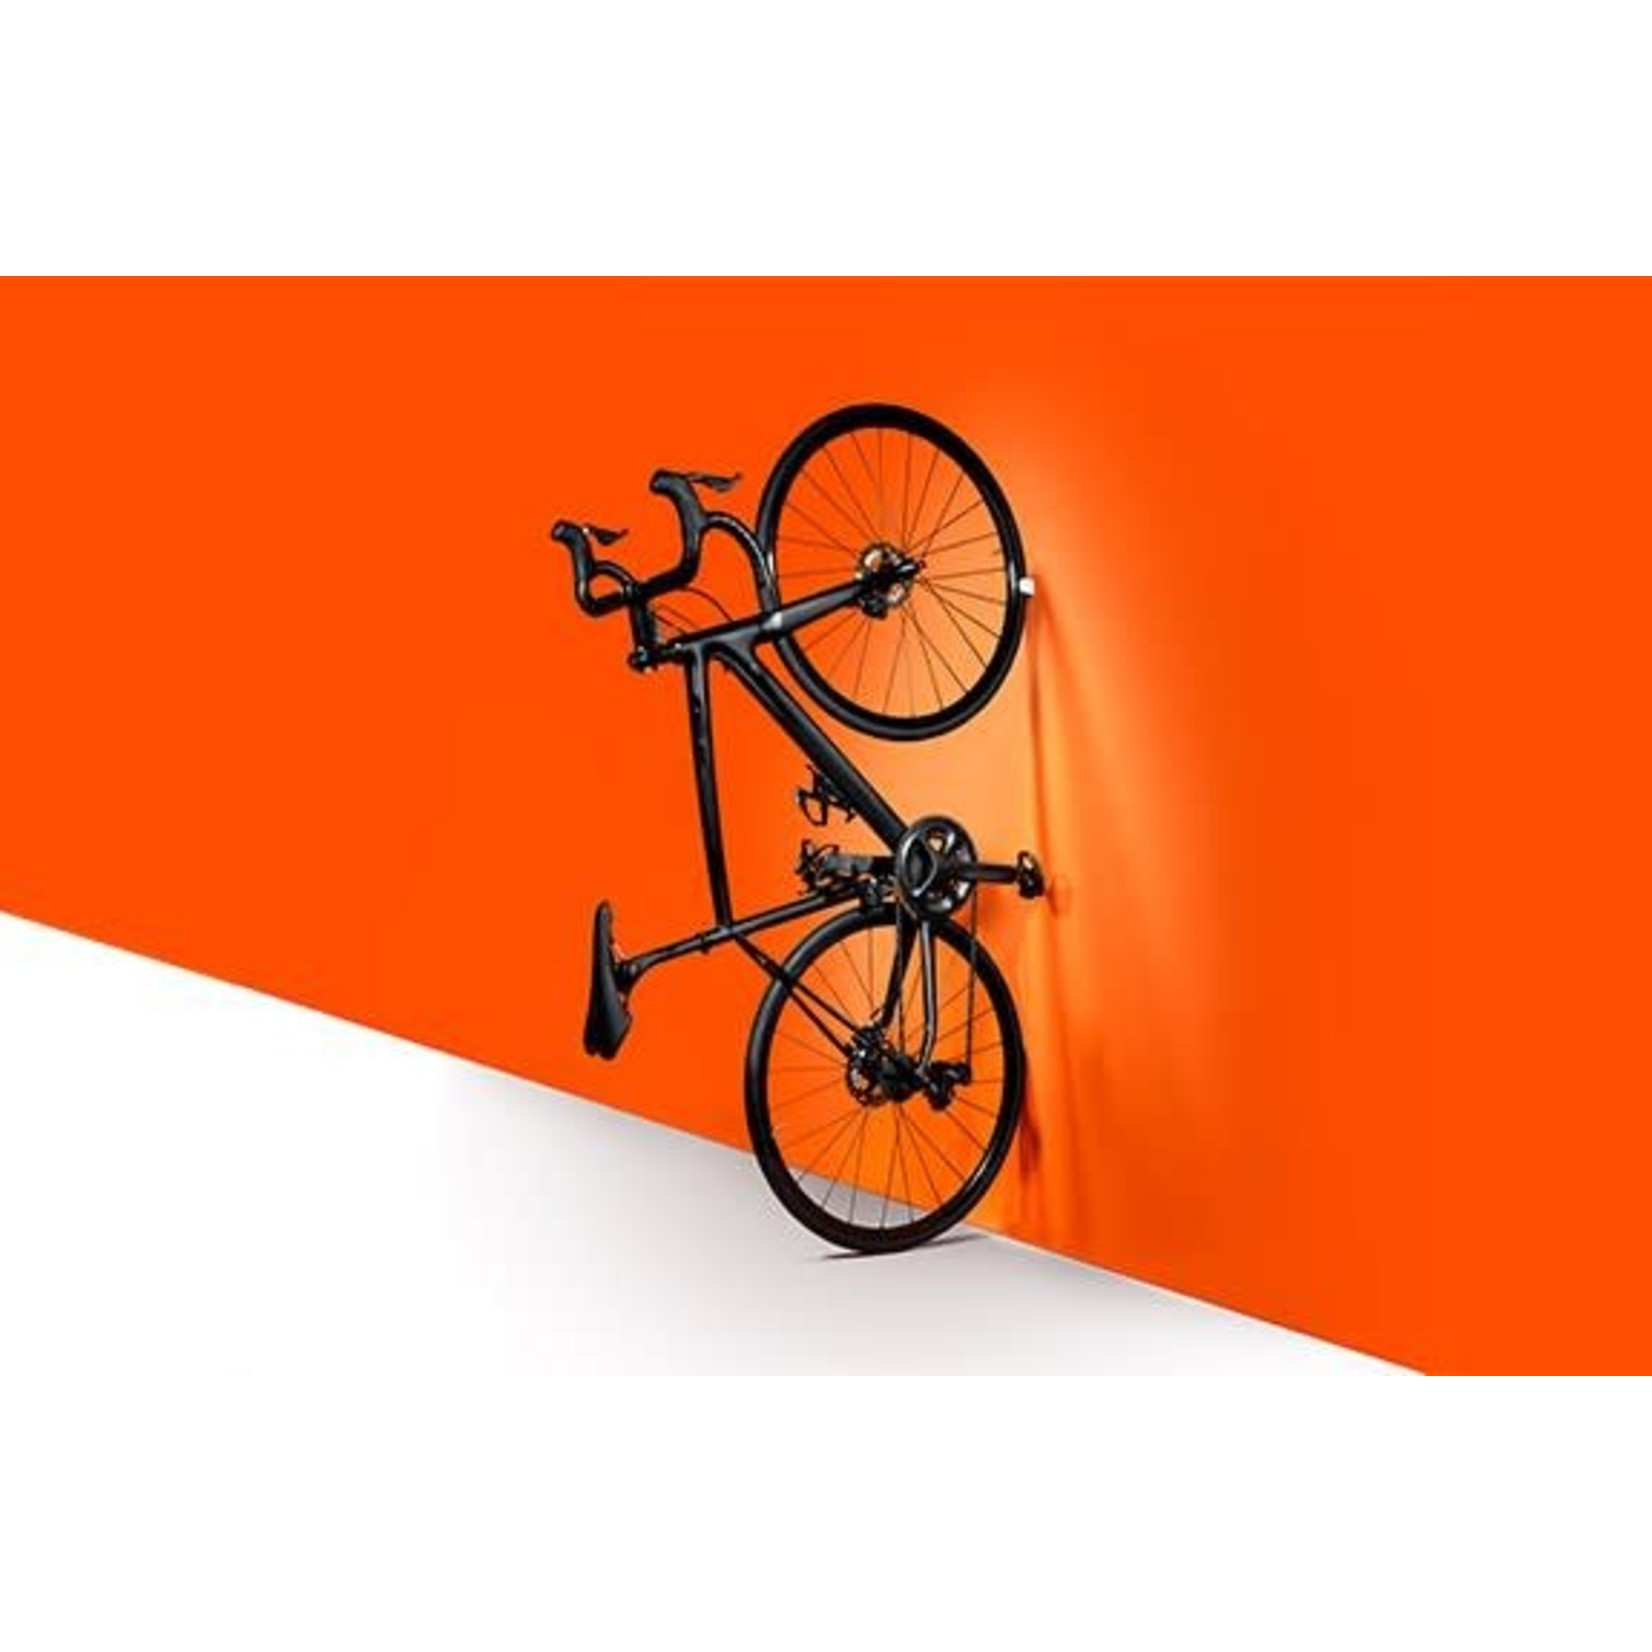 Clug Roadie Wall Mount Bicycle Rack Outside White/ Inside Orange, Fits tires 23mm-32mm